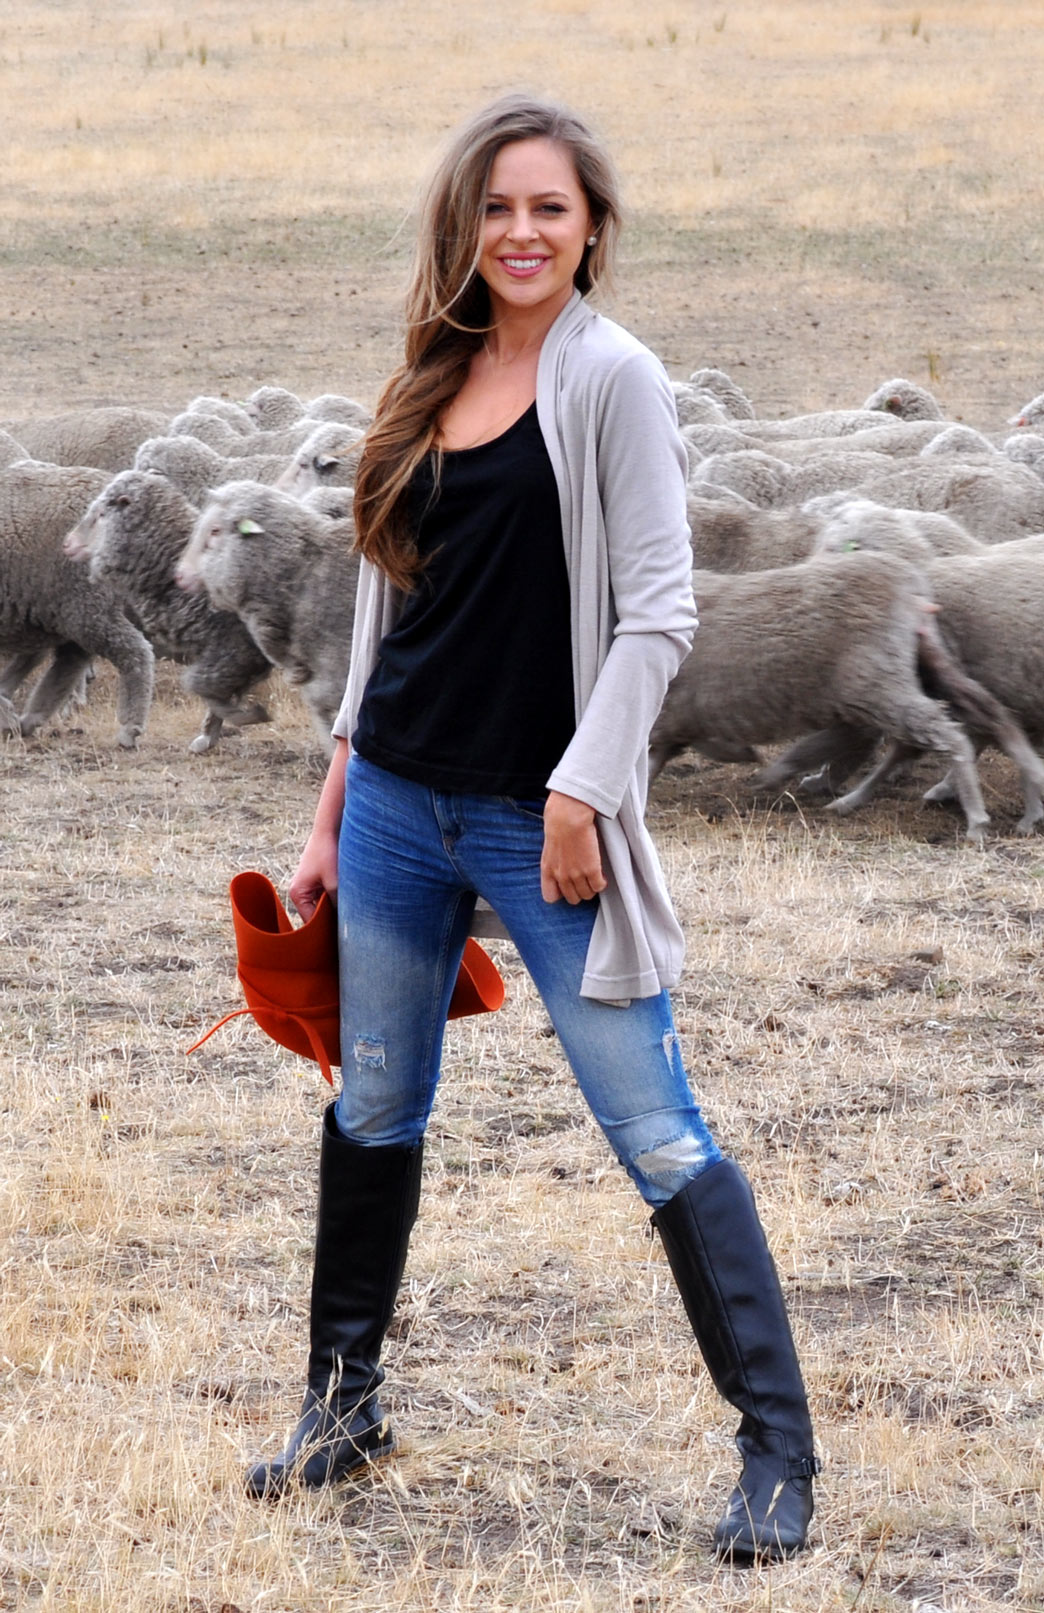 Drape Cardigan - Lightweight - Women's Stone Wool Drape Cardigan with no buttons or fastenings - Smitten Merino Tasmania Australia